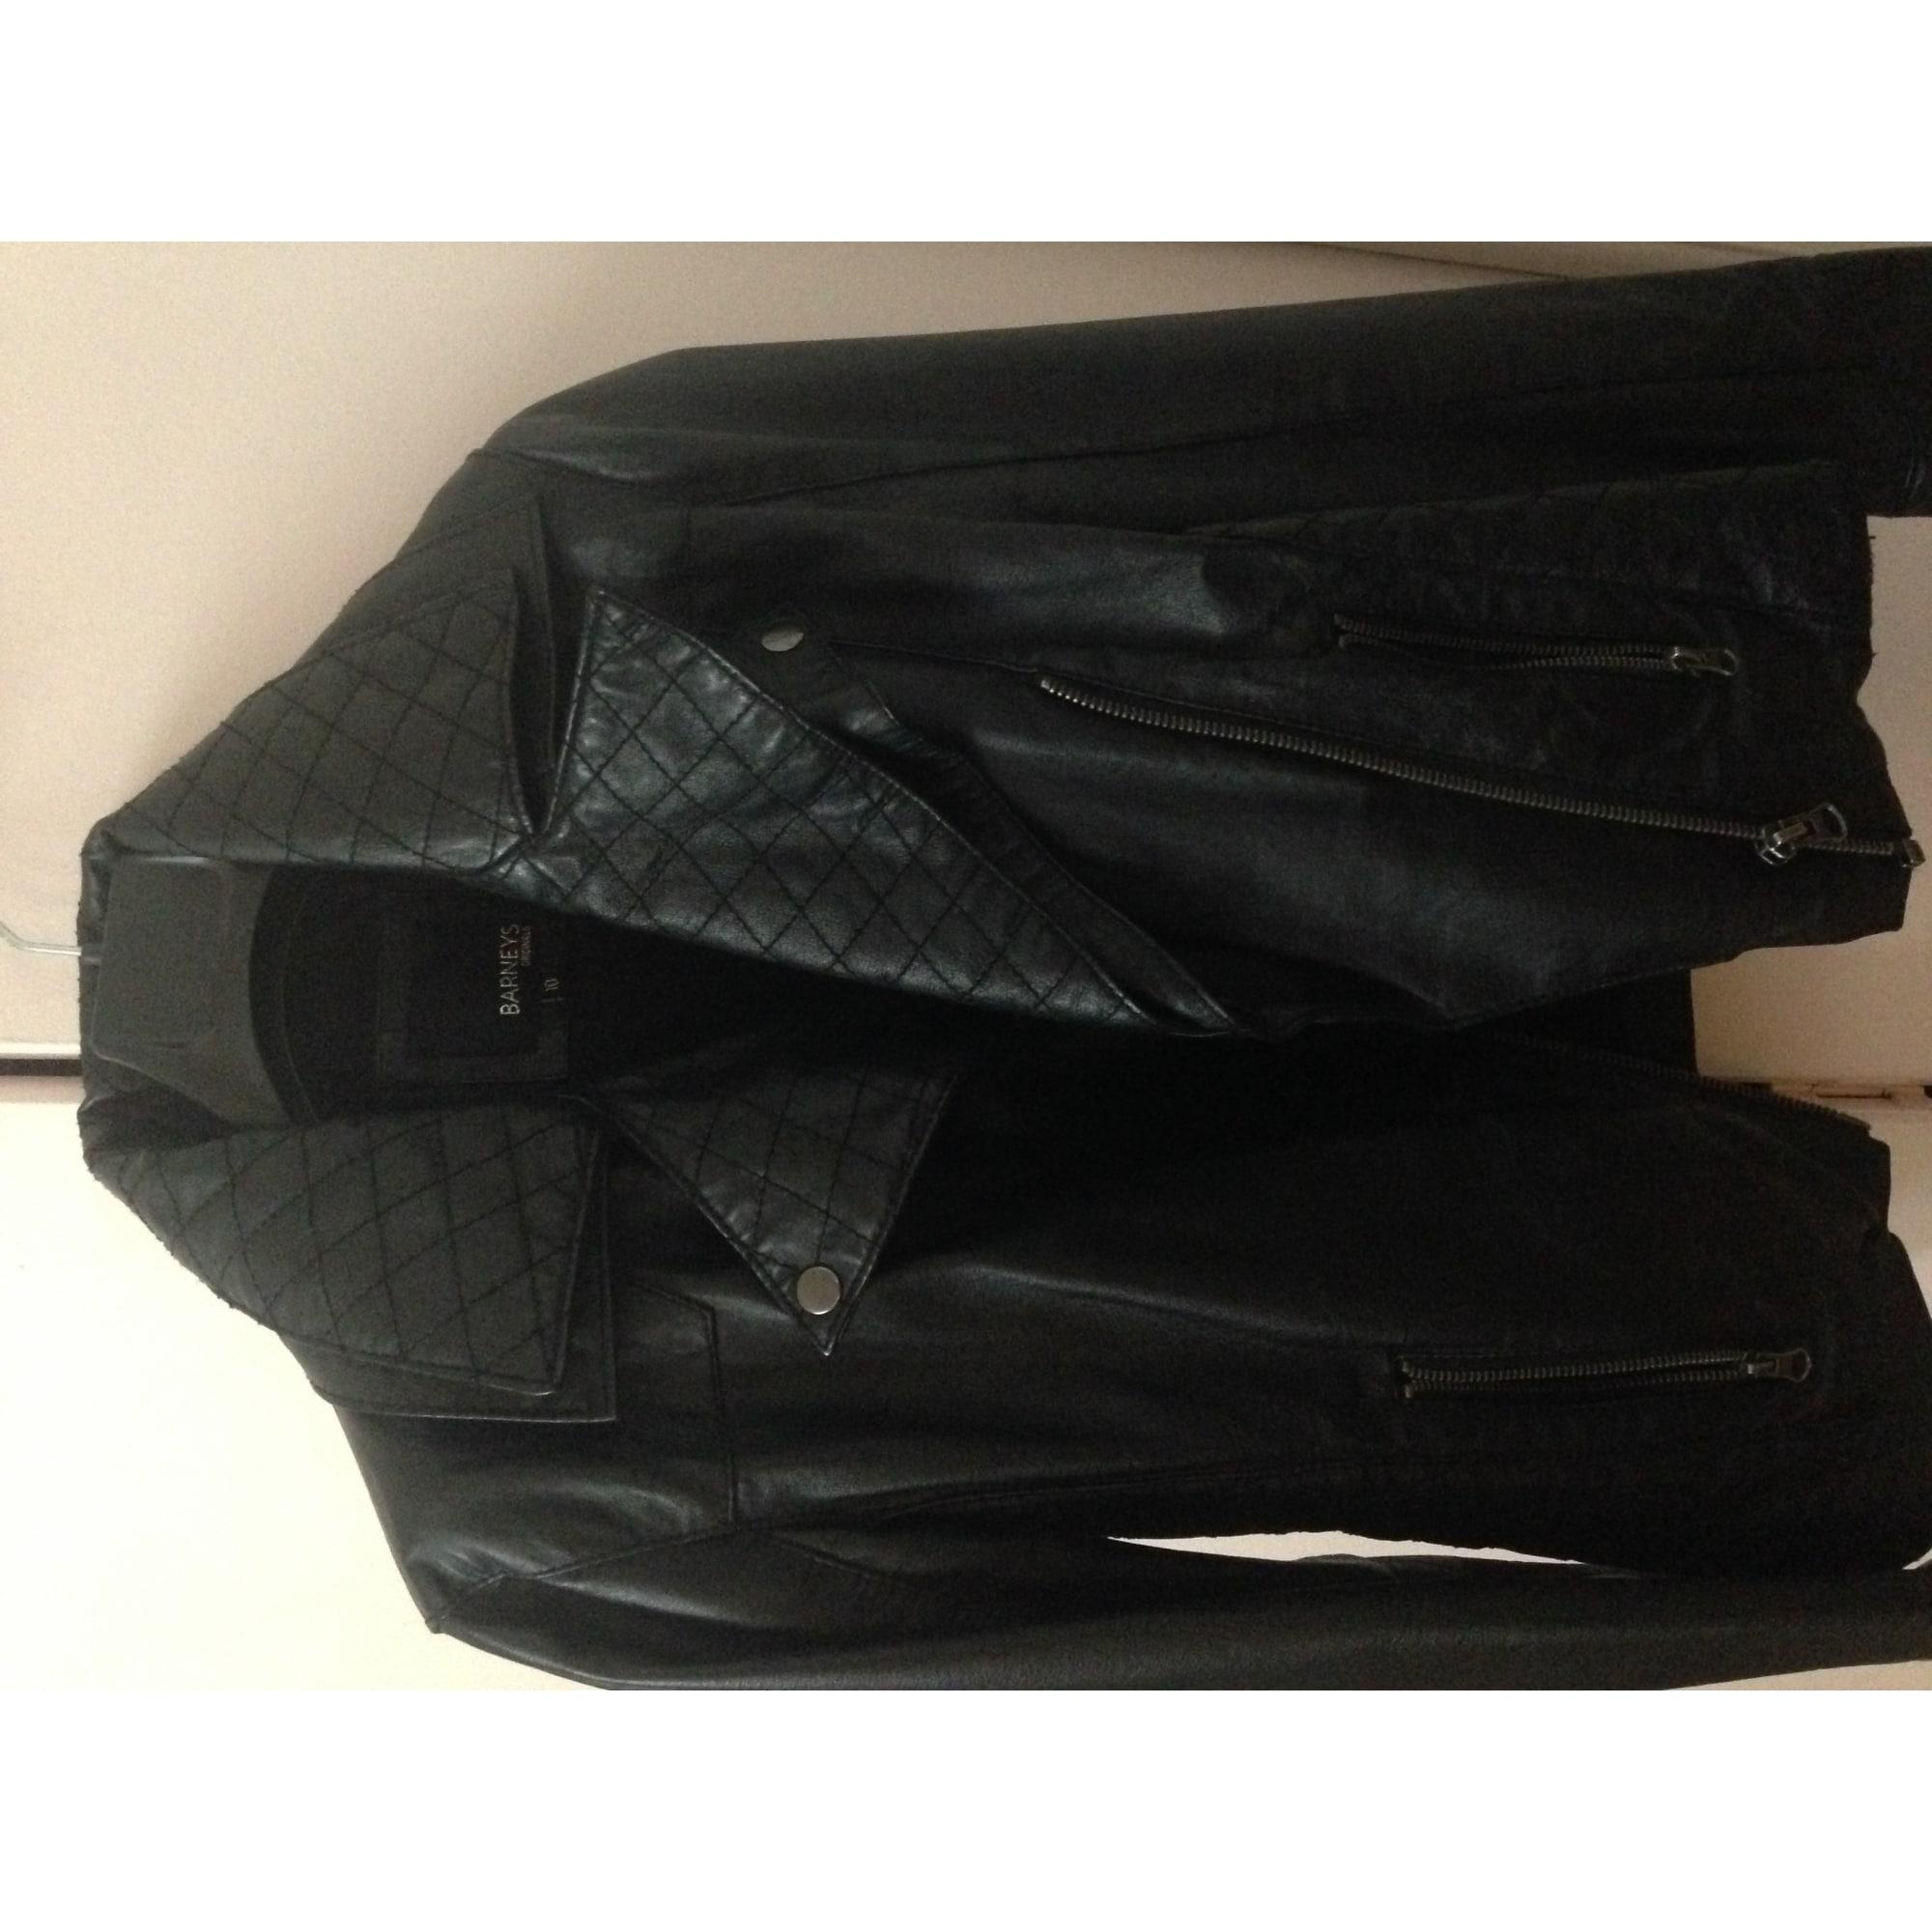 Vendu Vendu Vendu Barneys Cuir Originals Veste T2 Noir Noir Noir 38 m Par En 8xvOBEw